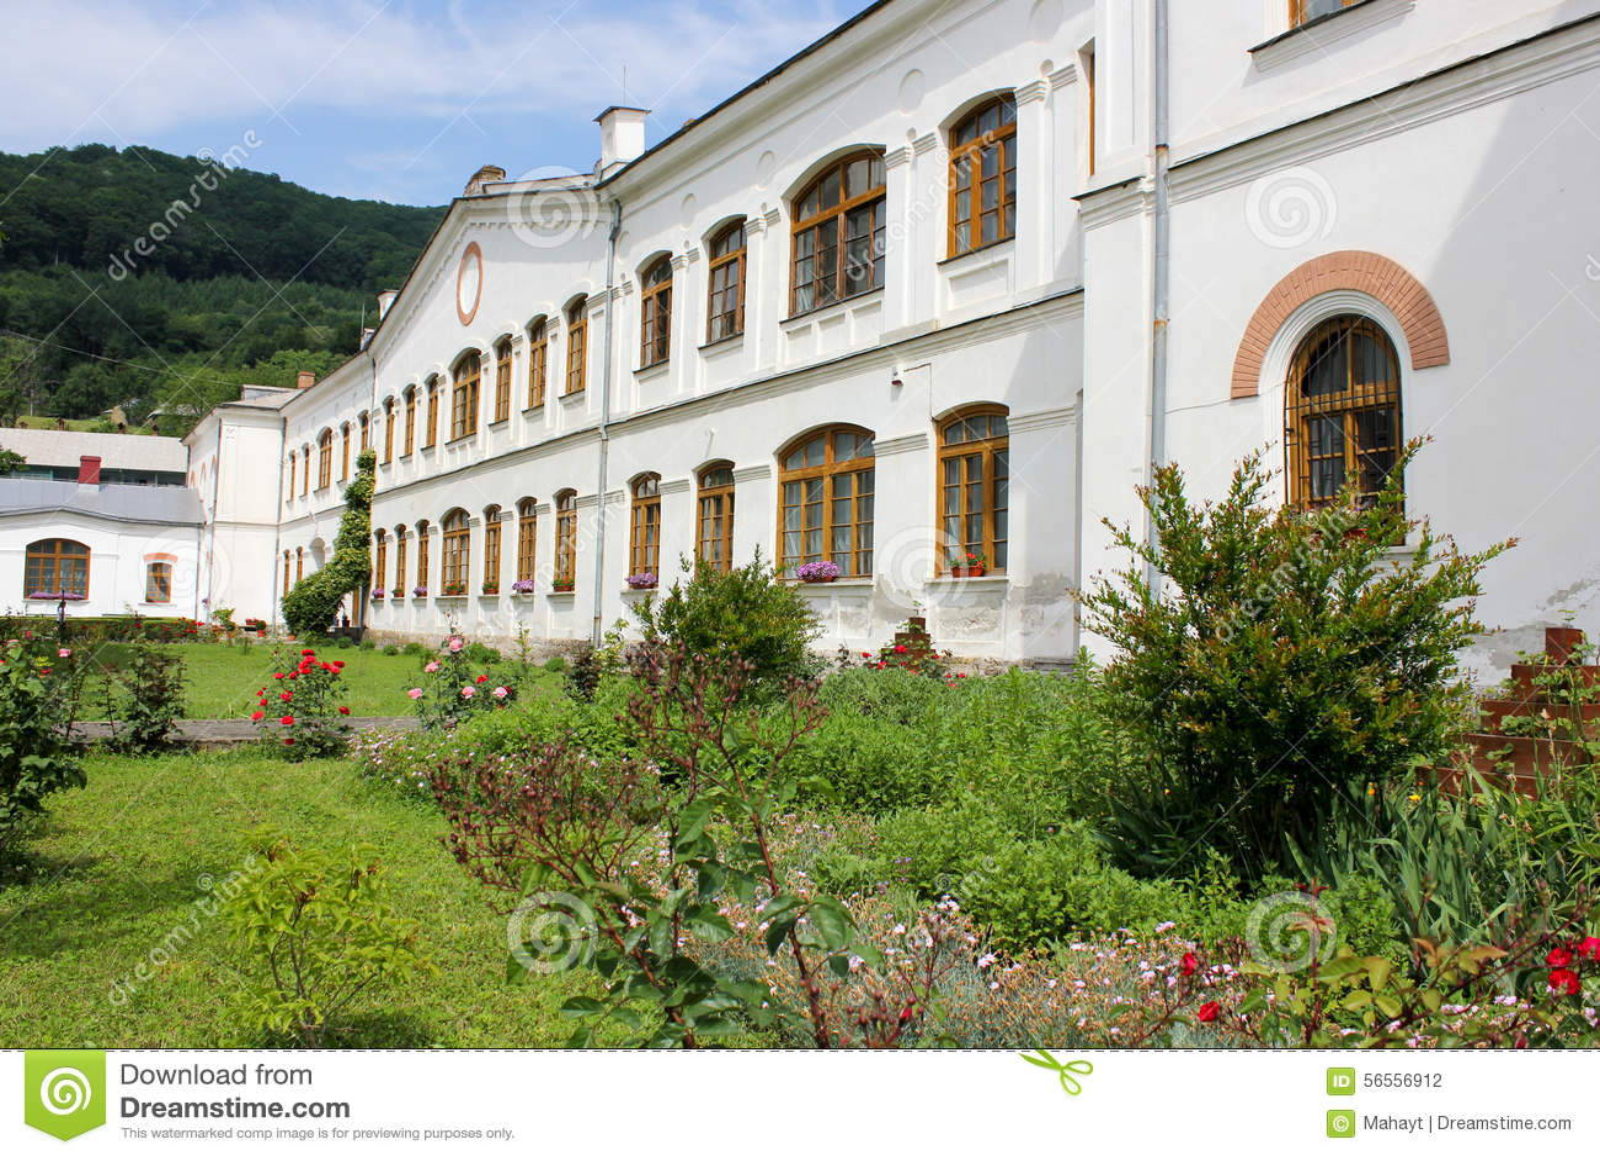 Download Αγροτικό τοπίο με το παλαιό μοναστήρι στη Ρουμανία Στοκ Εικόνες - εικόνα από λιβάδι, χώρα: 56556912